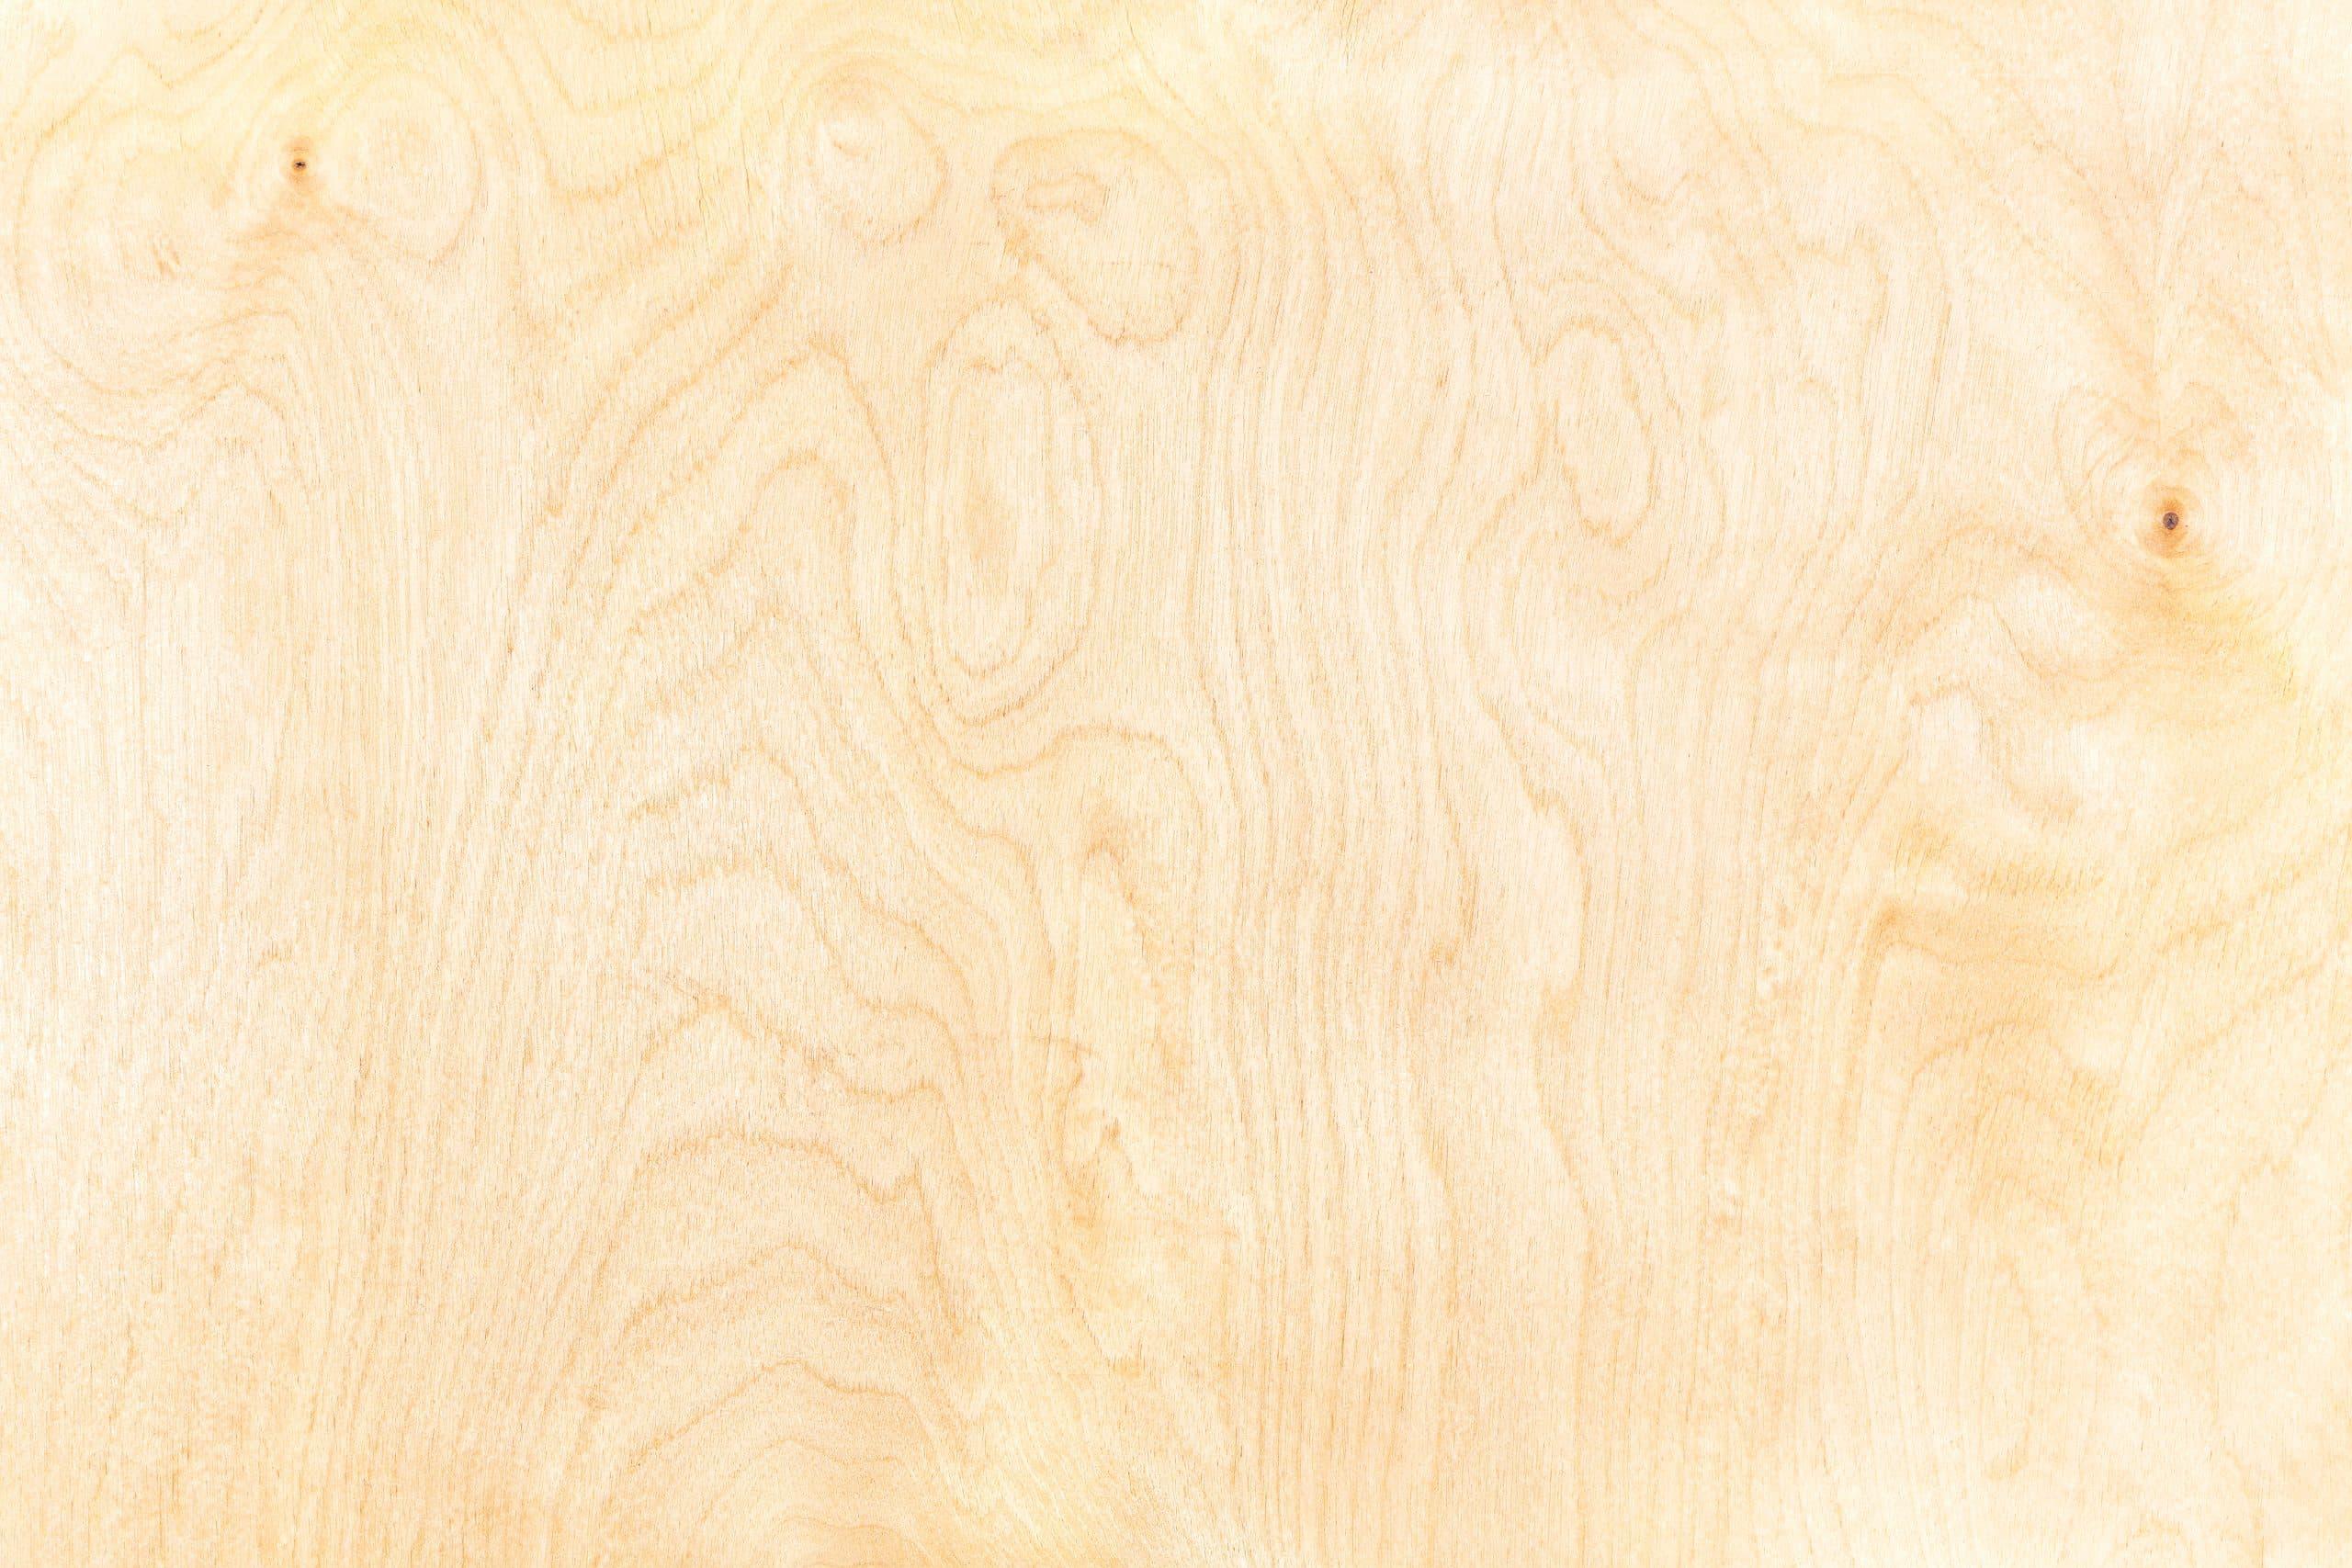 Plain Birch Ply - Untreated